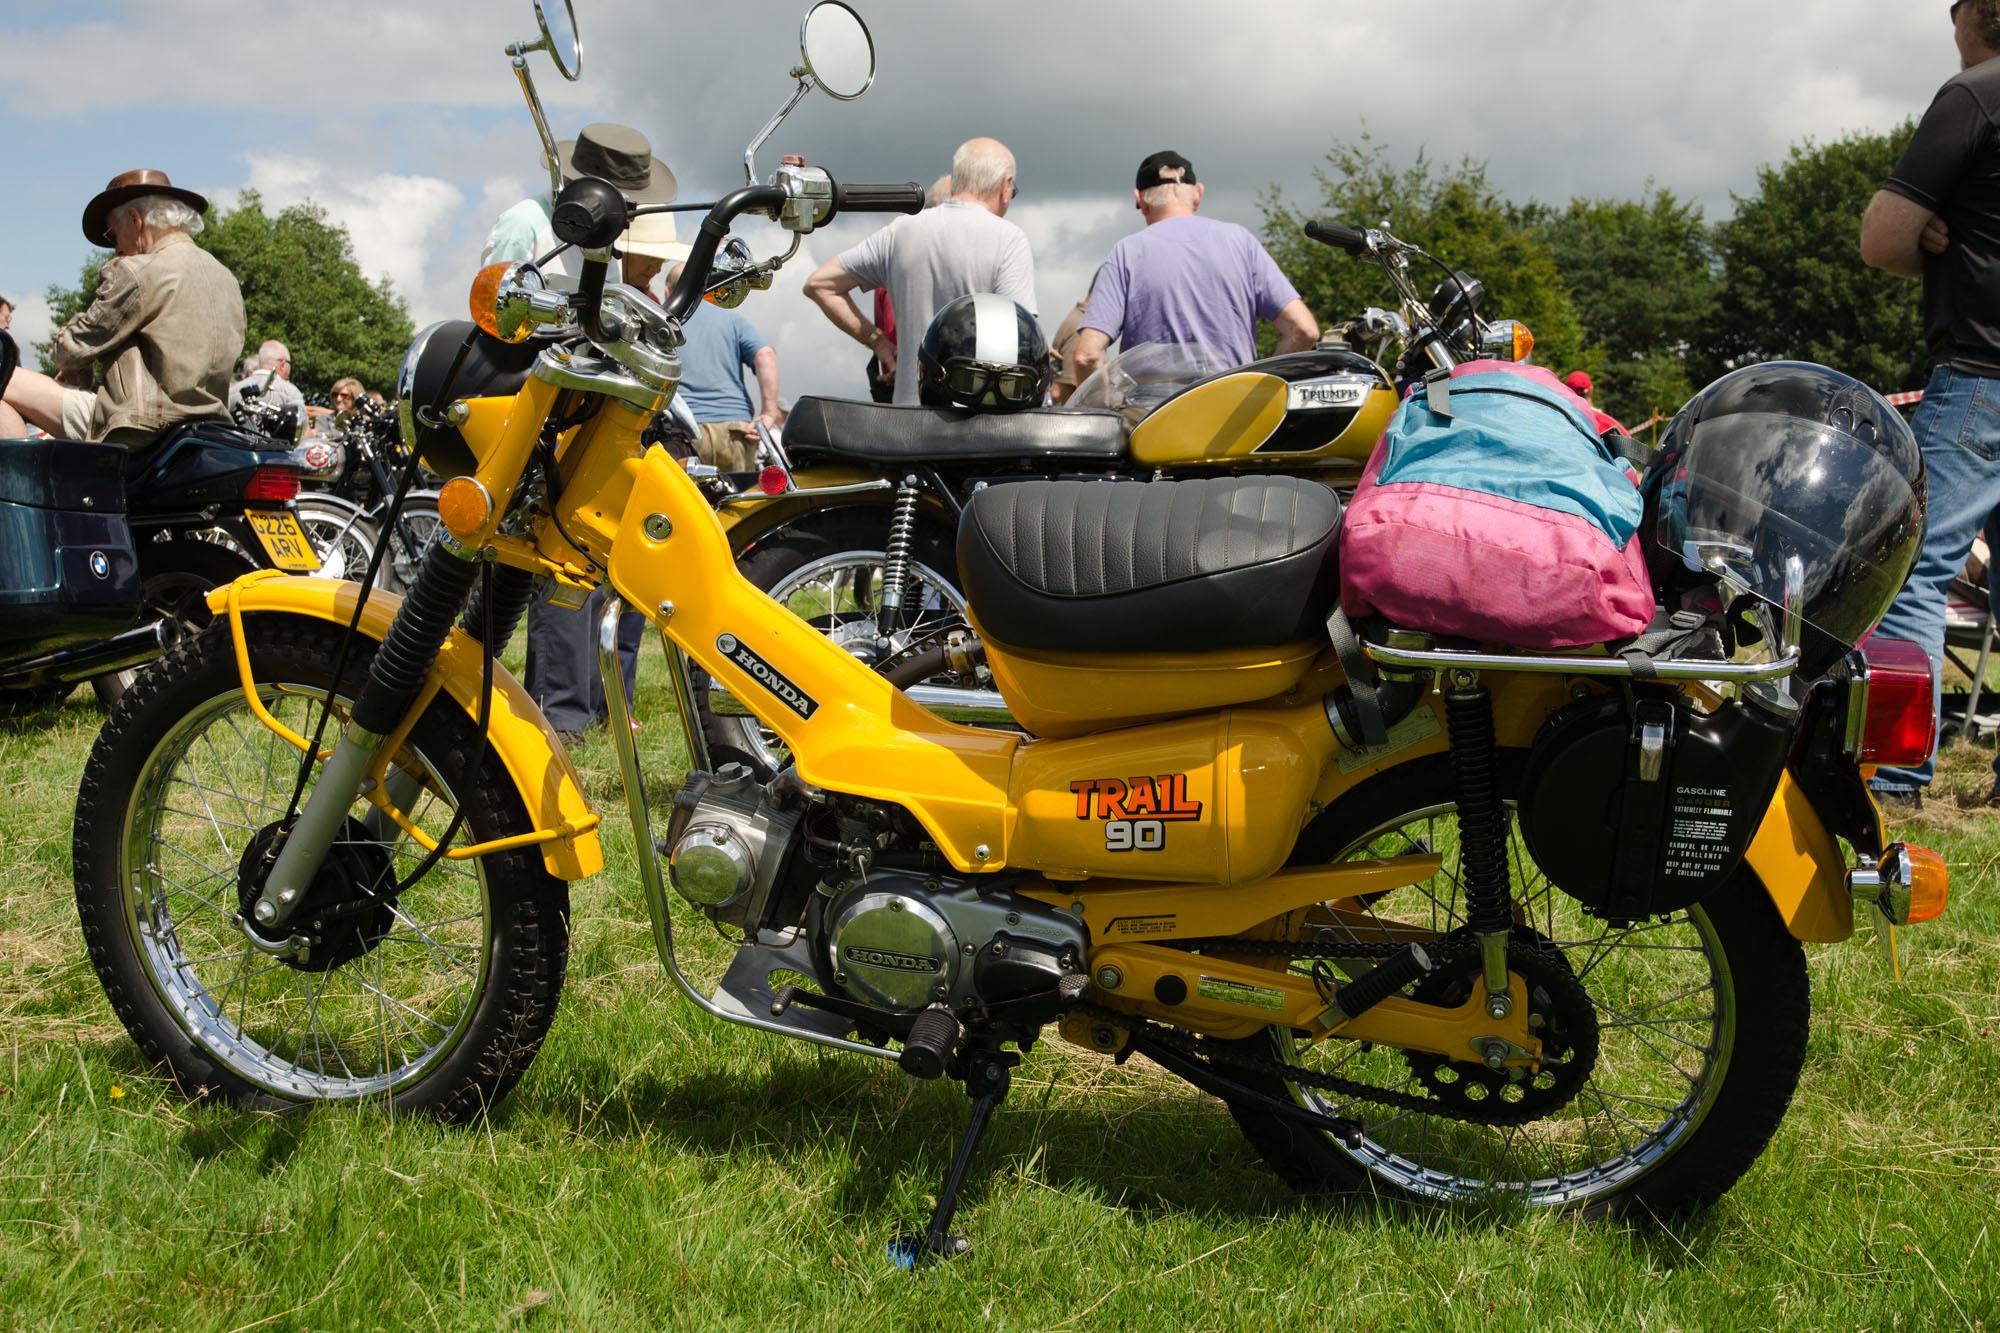 Honda_CT90_Trail_90_(1978)_-_15451153157